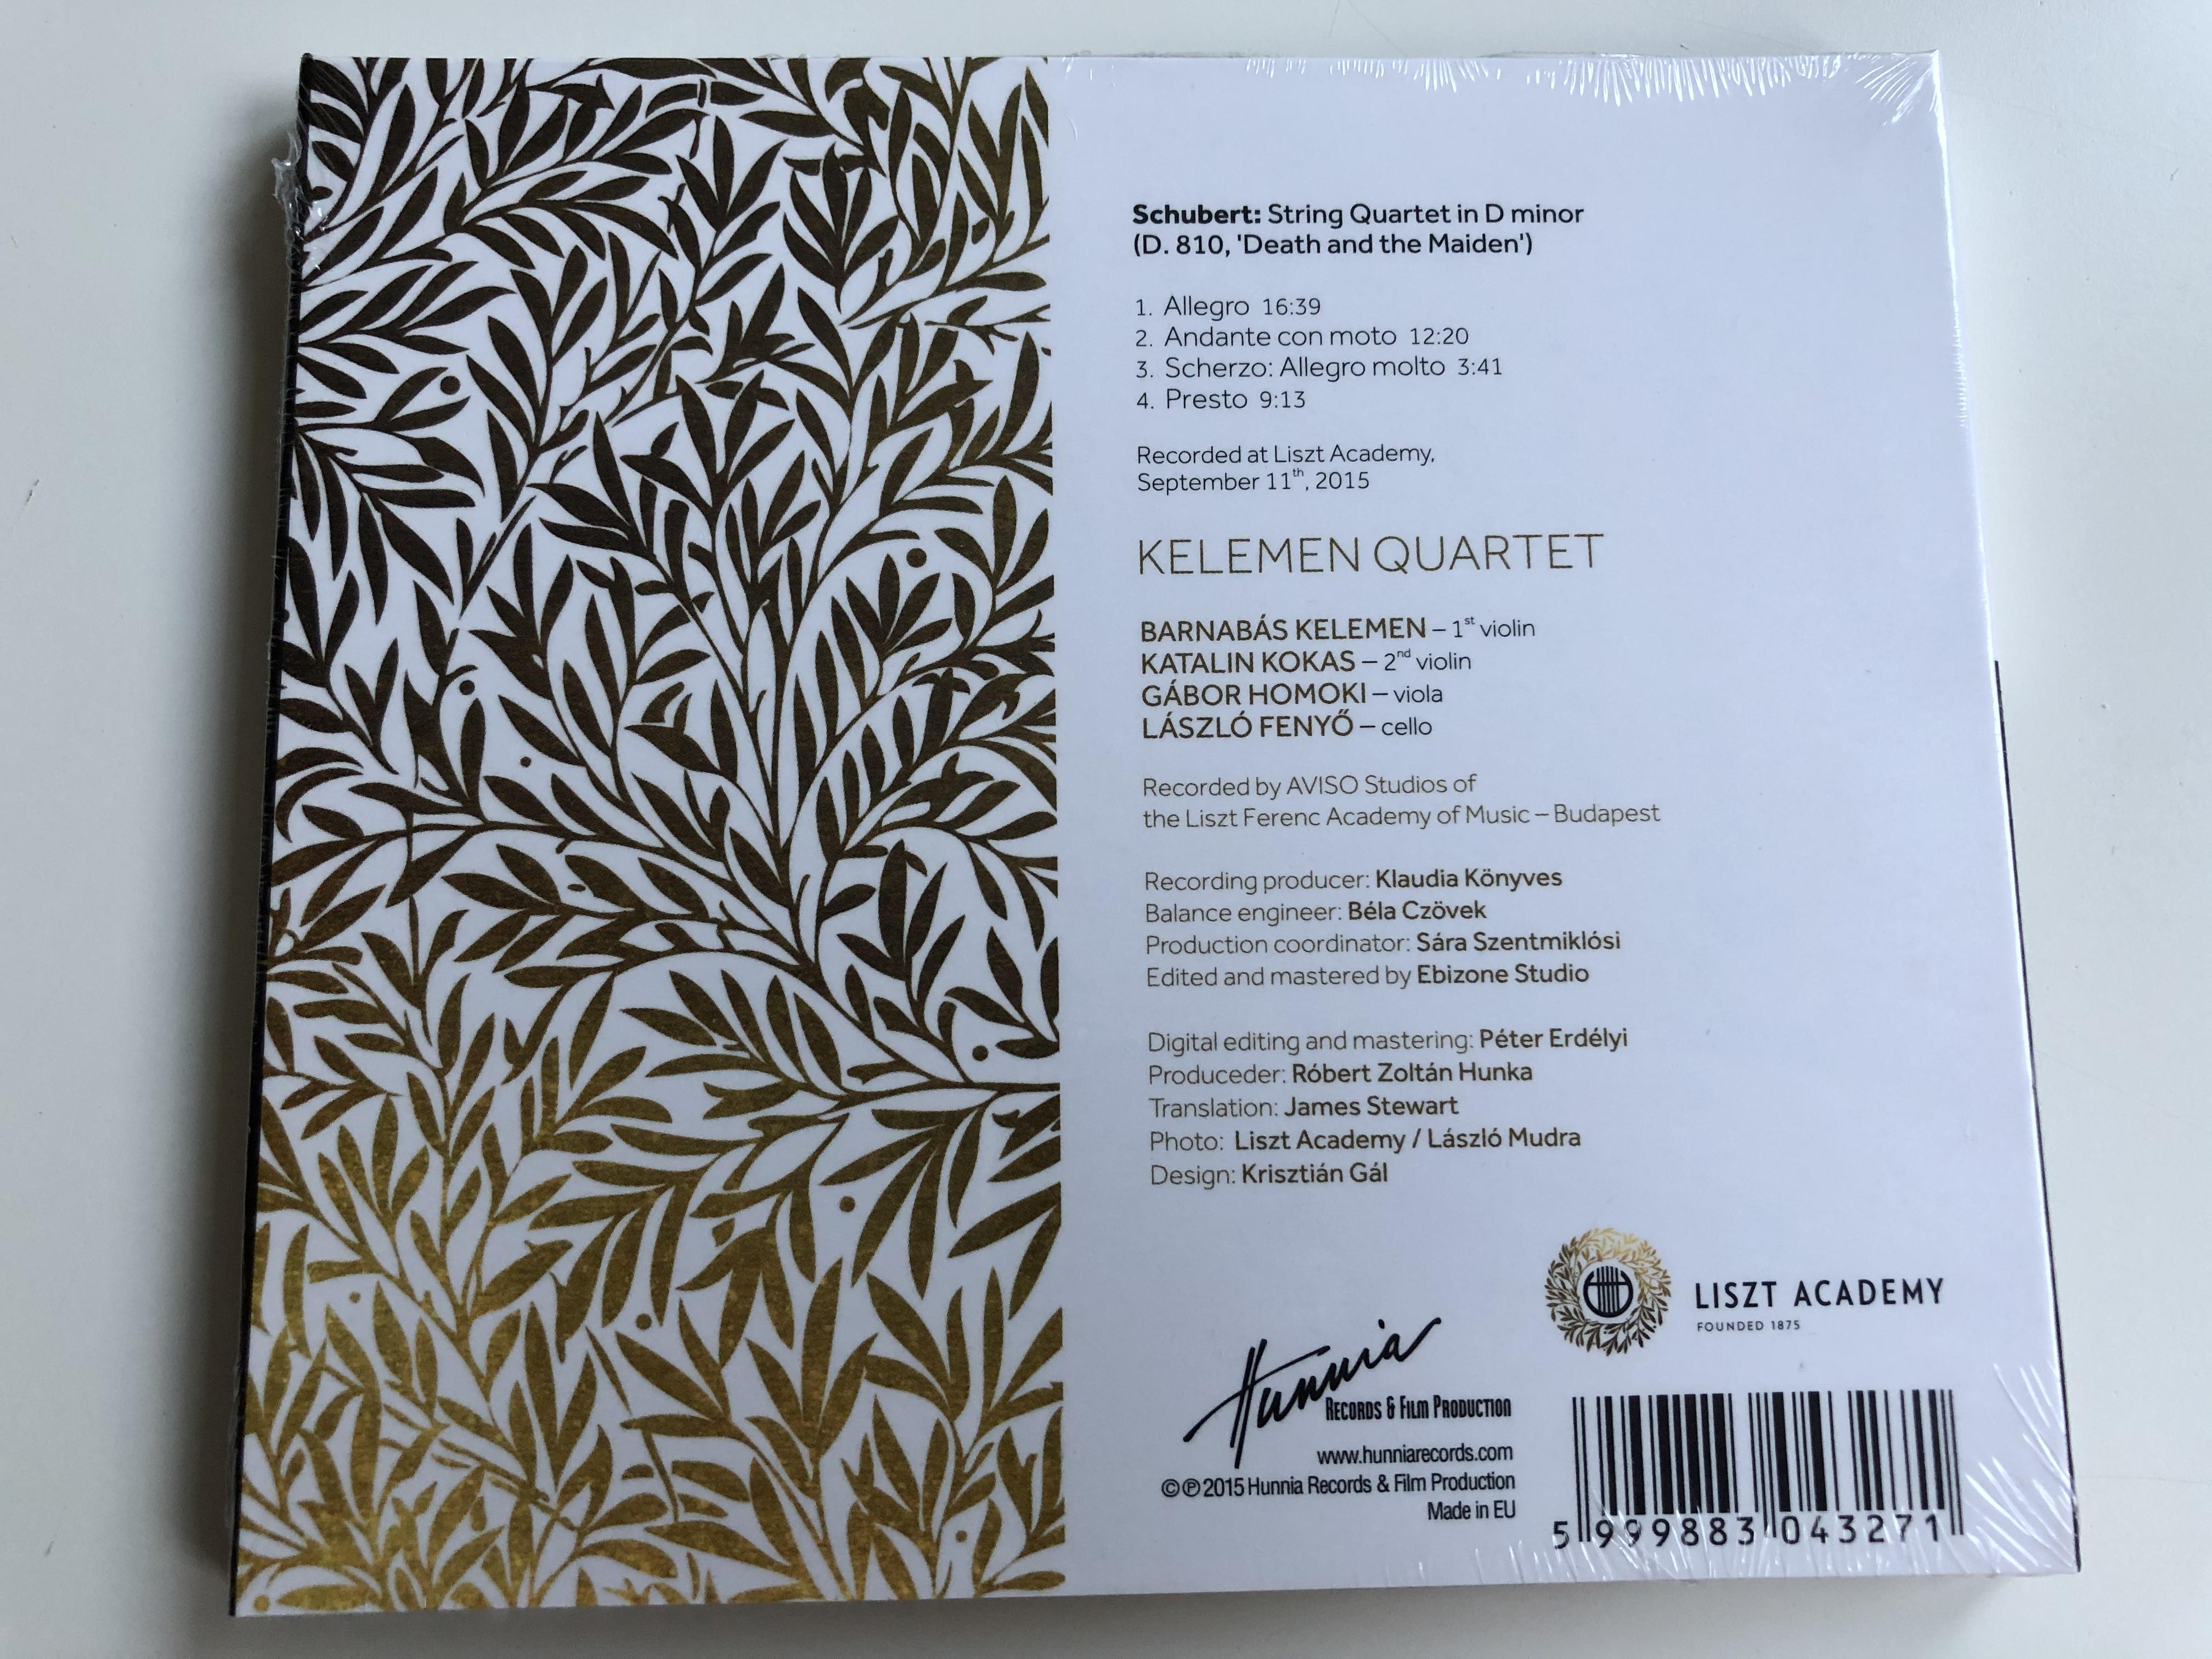 kelemen-quartet-schubert-string-quartet-in-d-minor-d.-810-death-and-the-maiden-live-from-liszt-academy-hunnia-records-film-production-audio-cd-2015-hrcd-1518-2-.jpg